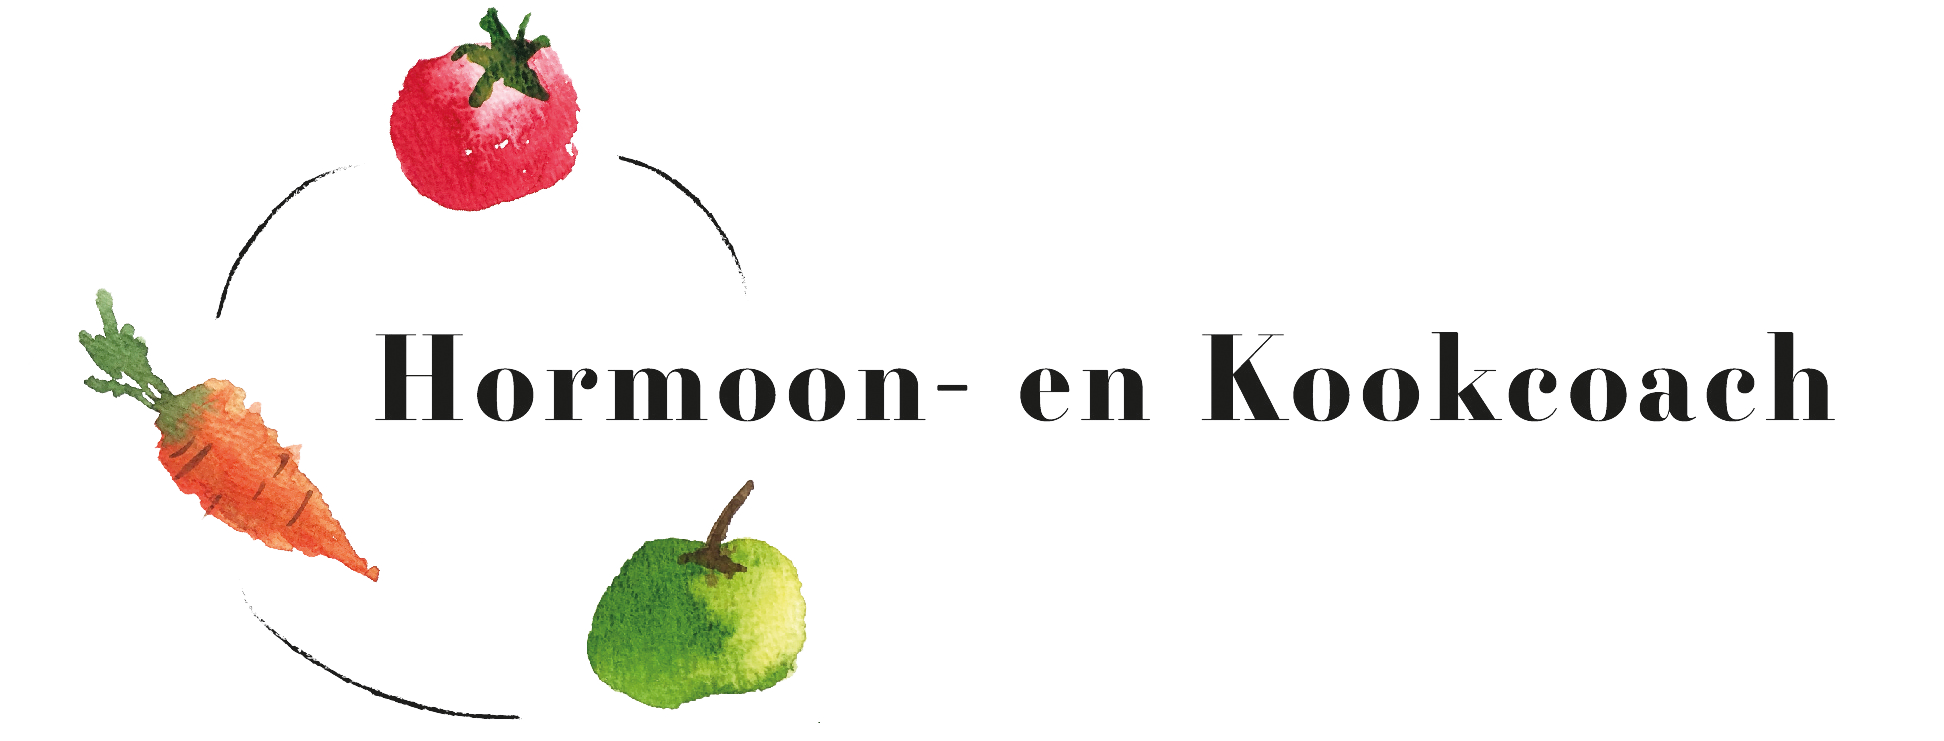 Hormoon-kookcoach shop